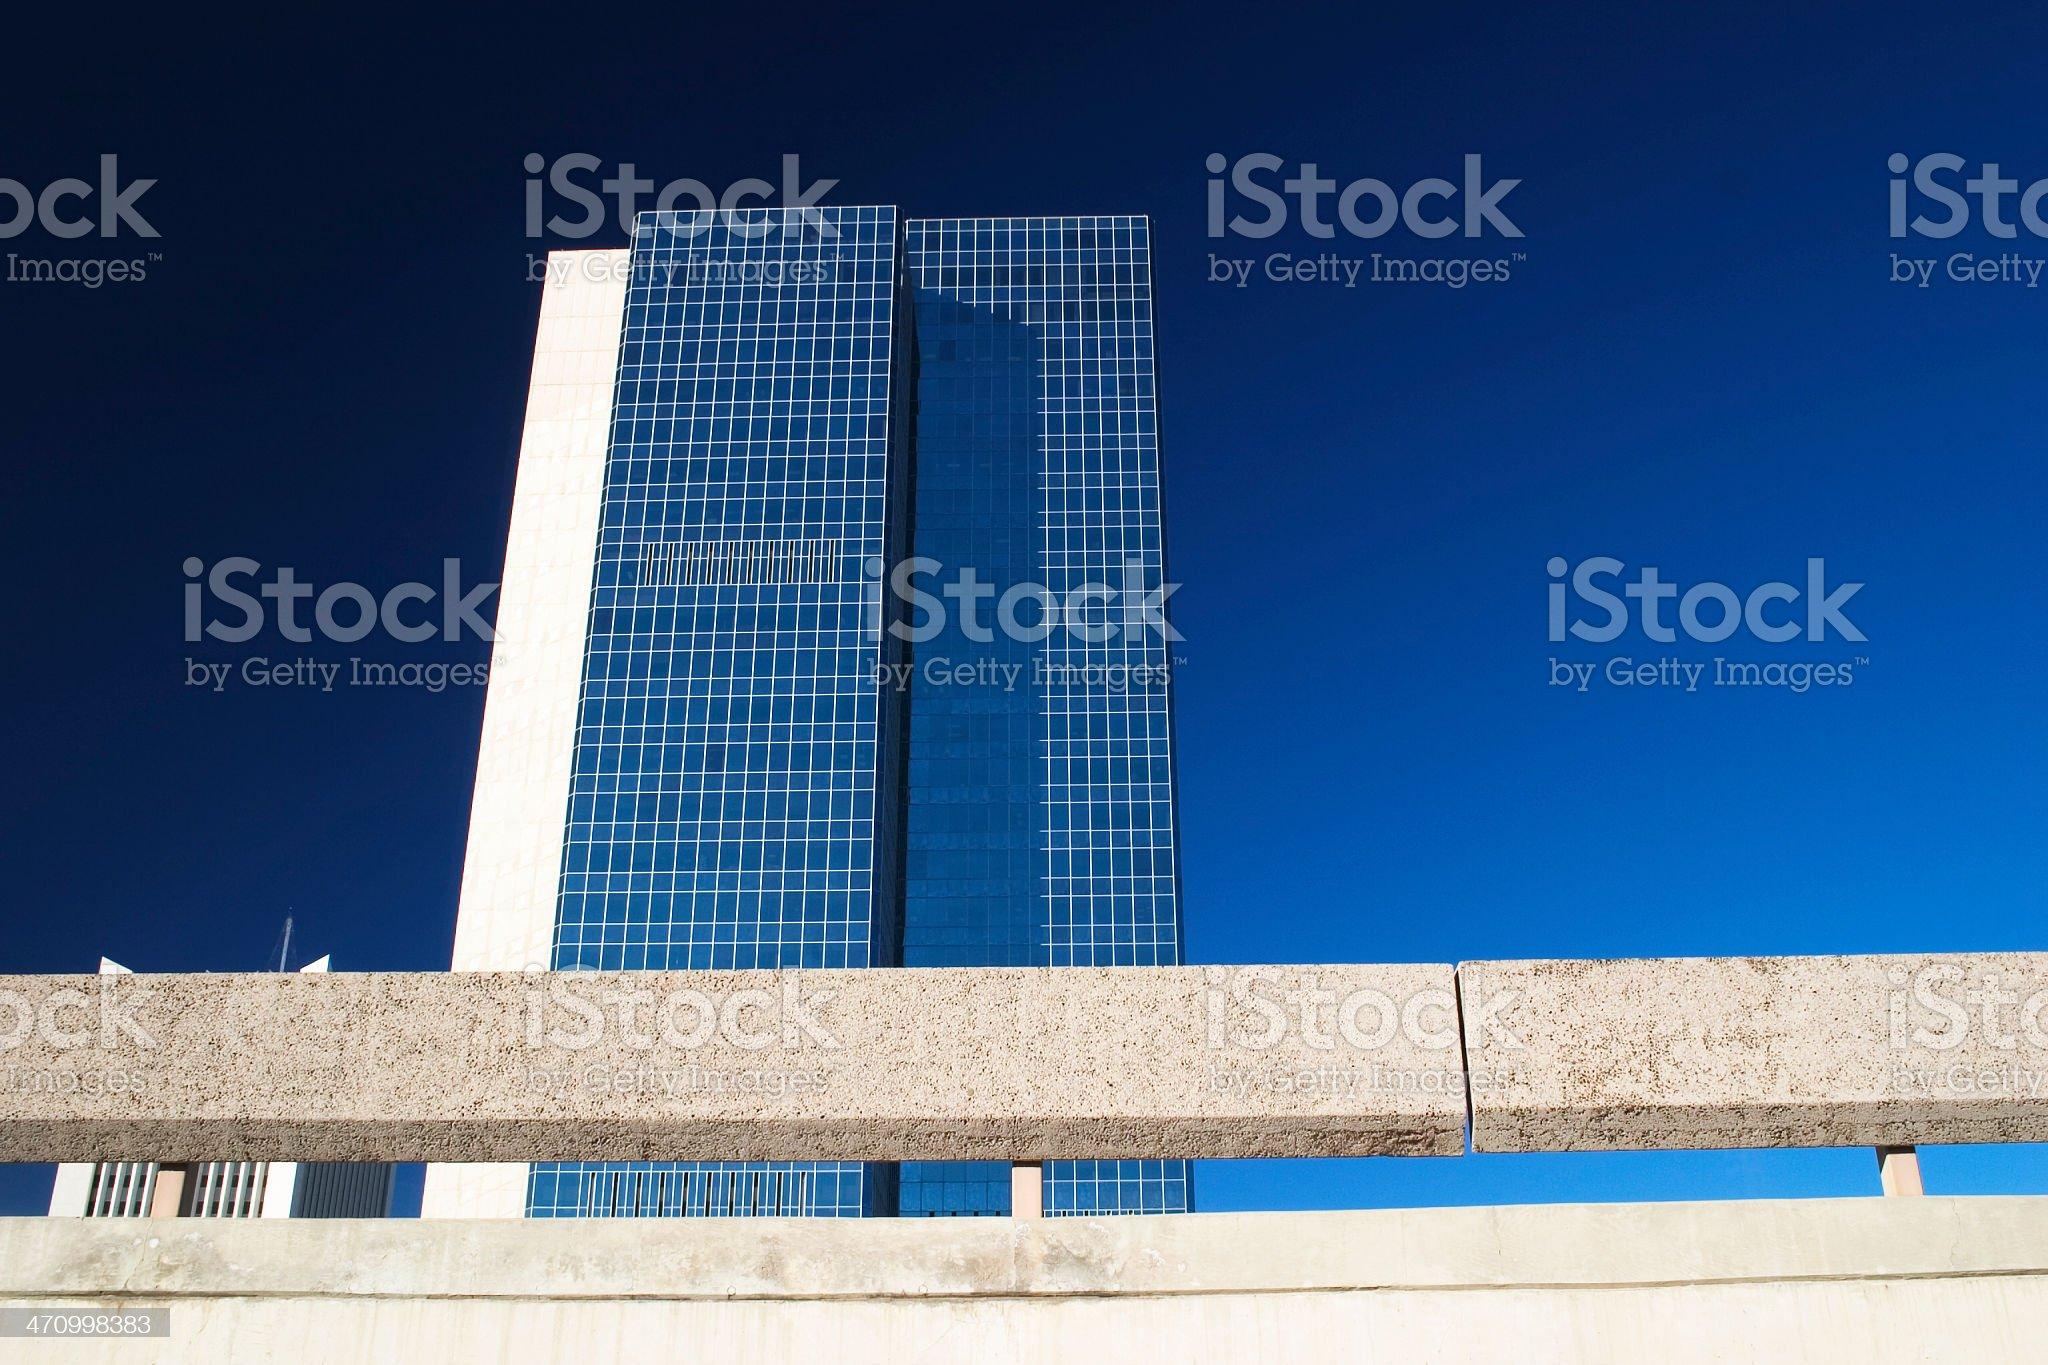 Skyscraper against stark blue sky royalty-free stock photo